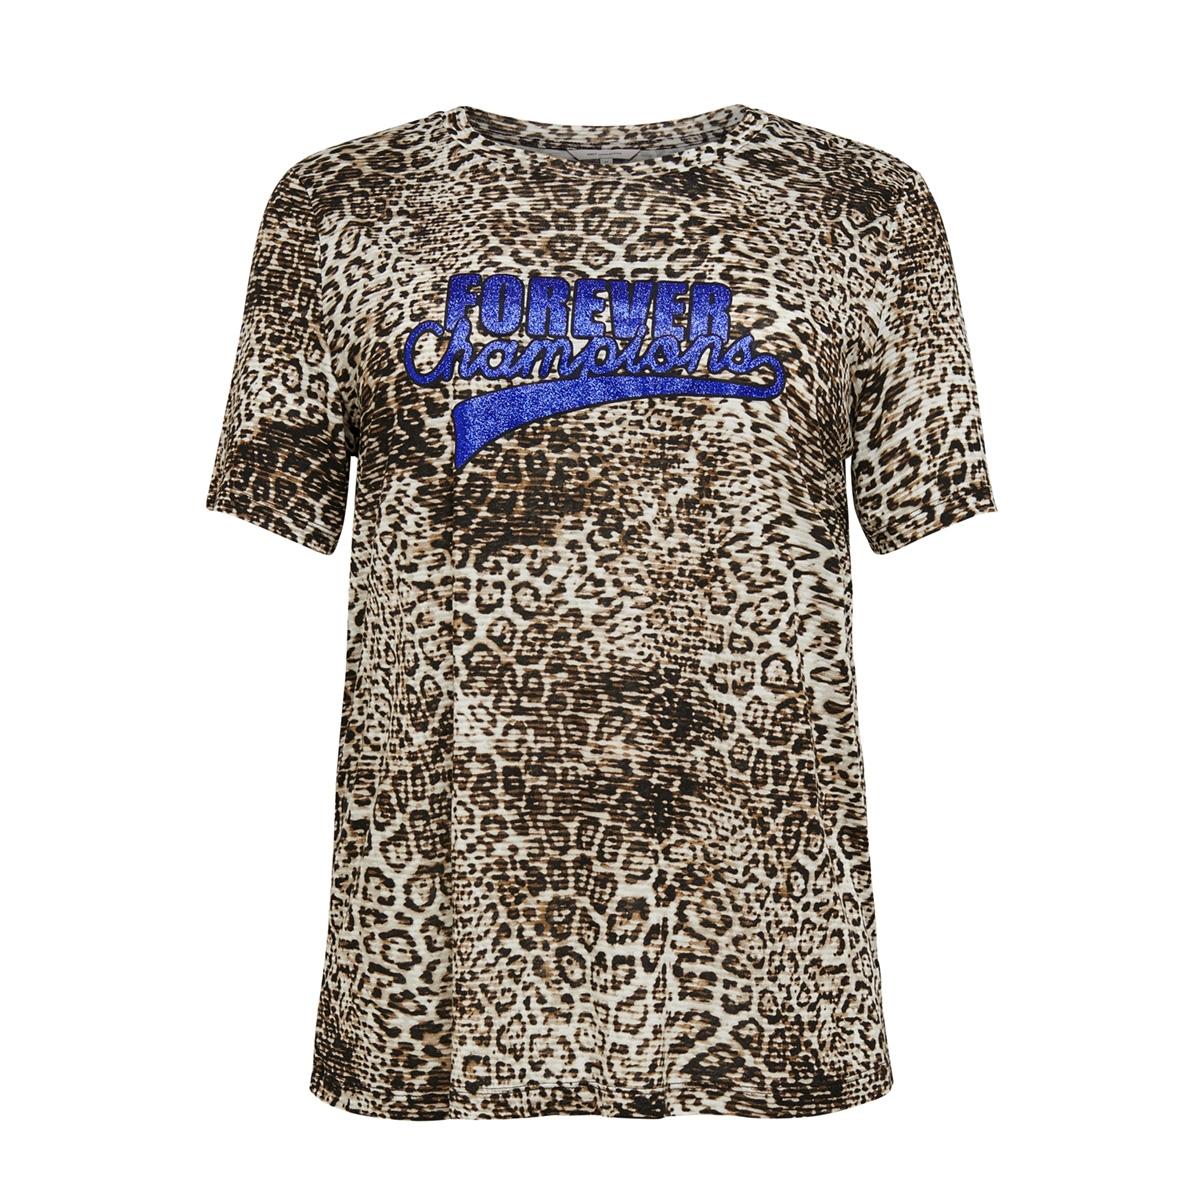 cardonna ss tee 15176978 only carmakoma t-shirt black/leo